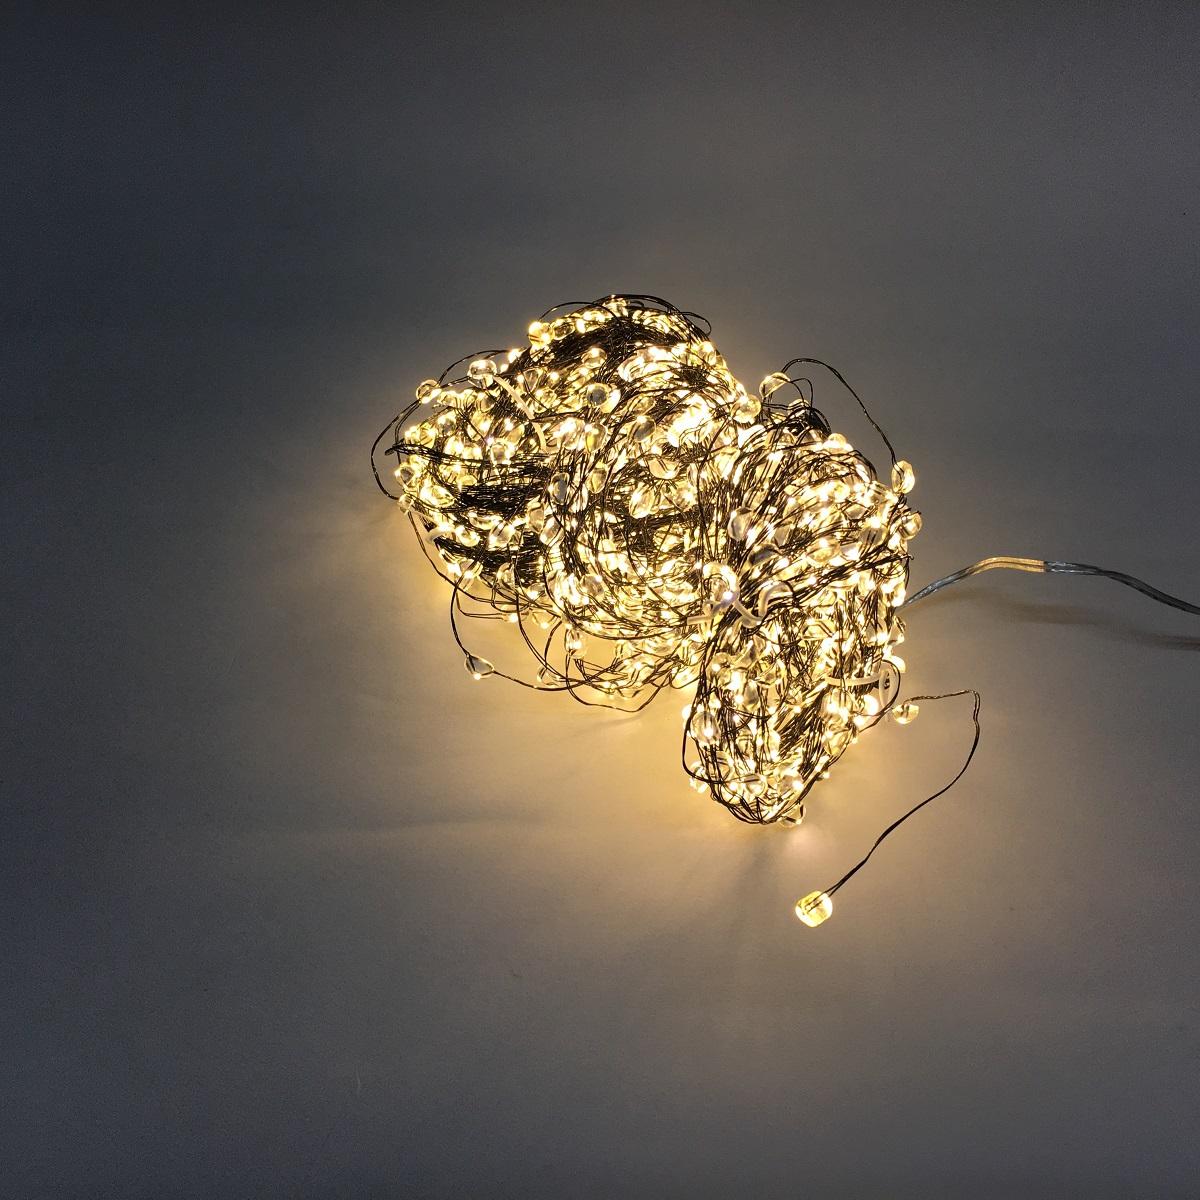 lampenhelden am design led lichterkette led regen big bubble schwarz 700 lichter innen au en. Black Bedroom Furniture Sets. Home Design Ideas